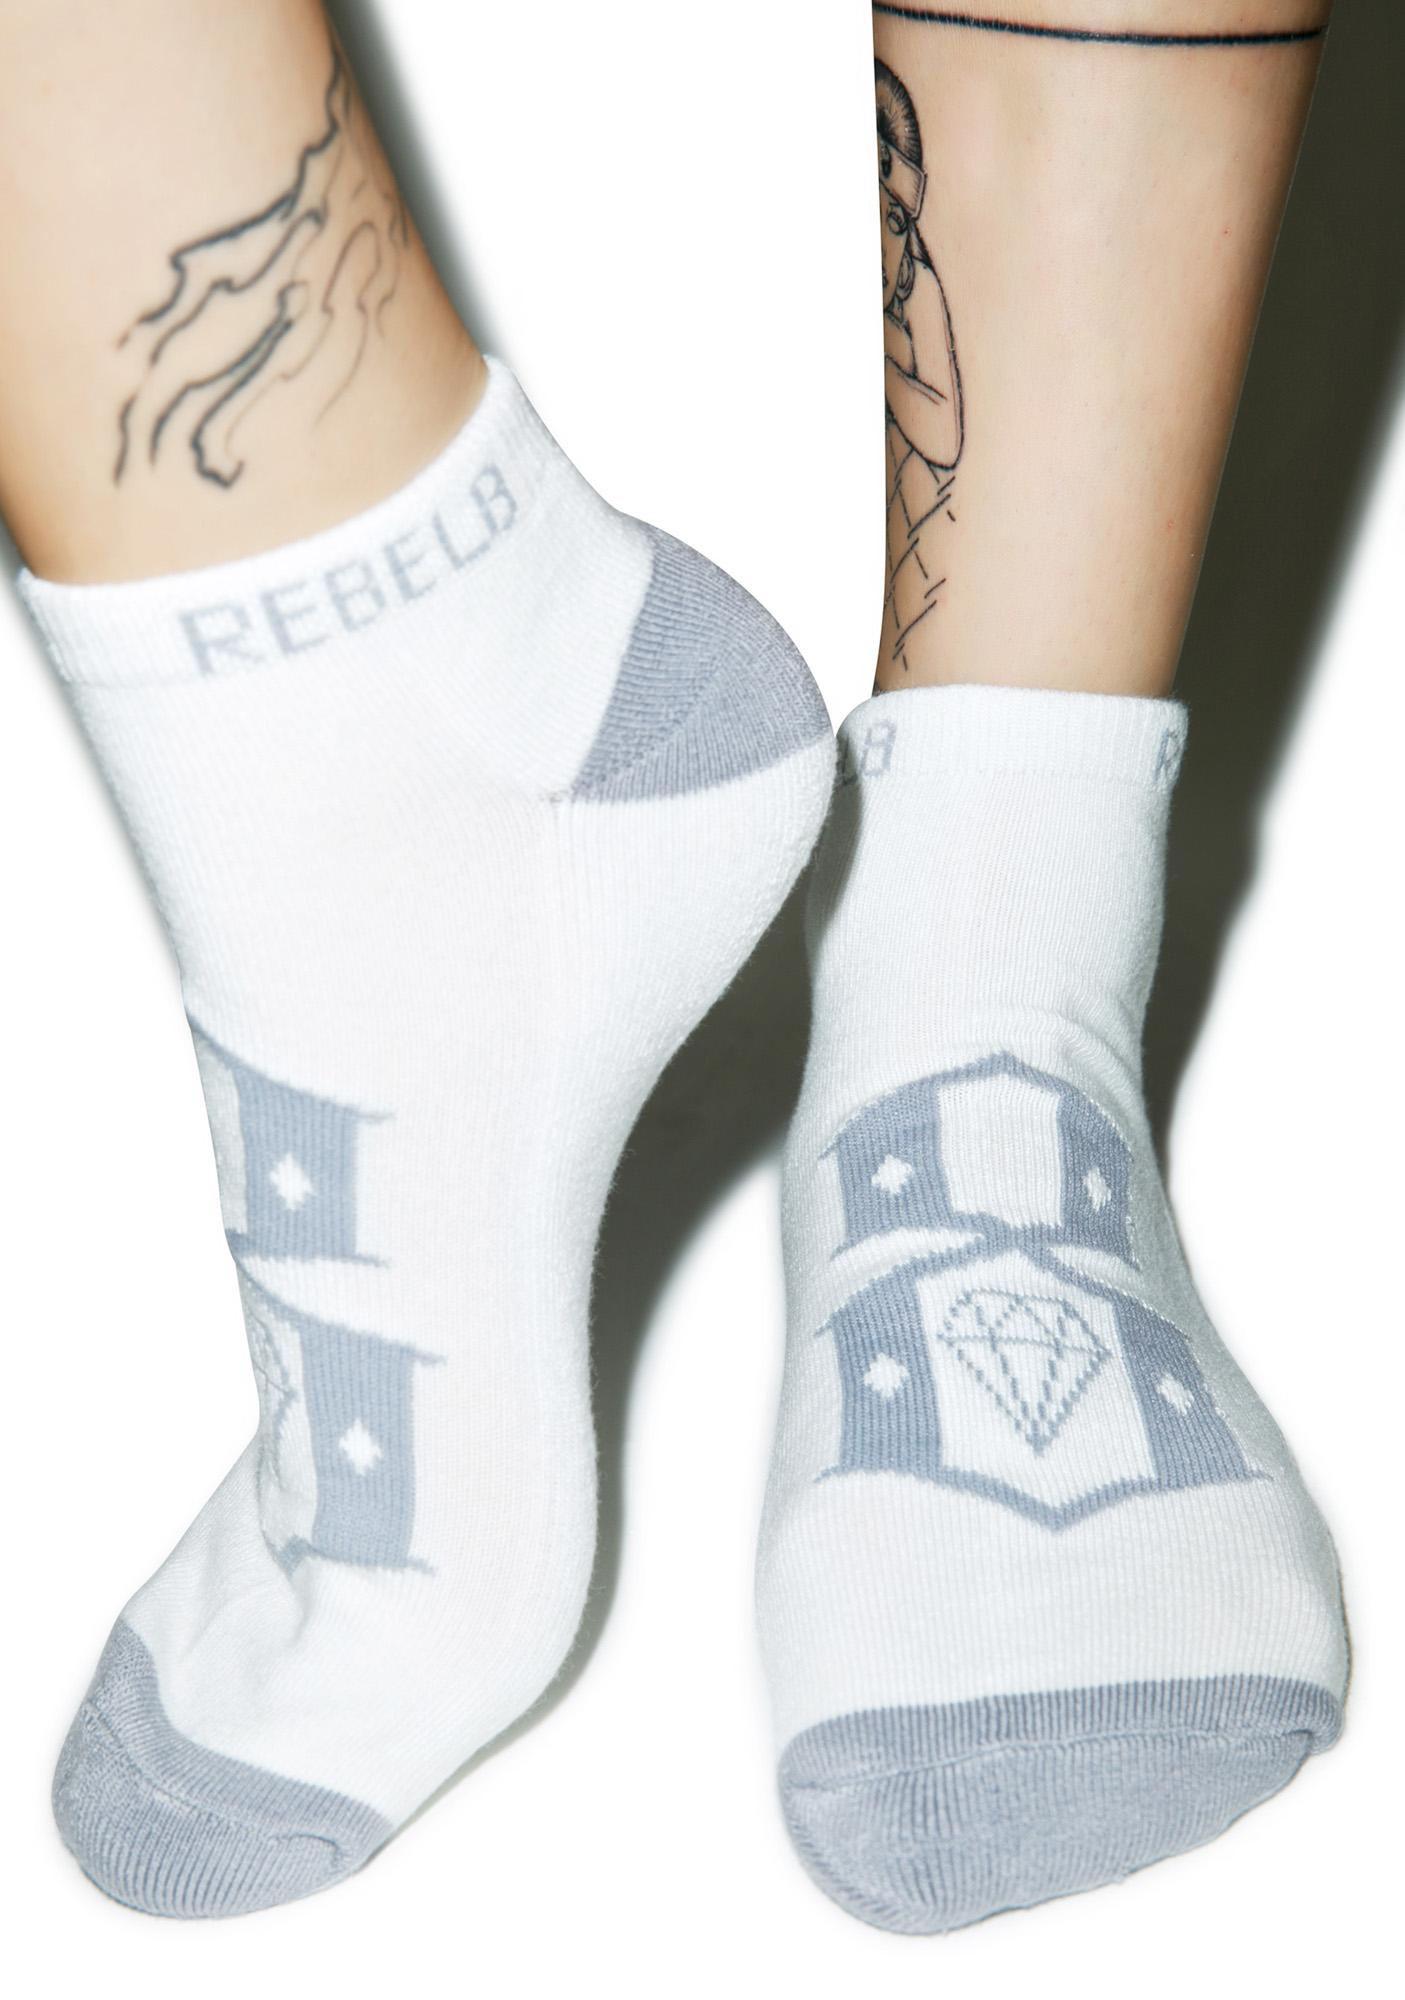 Rebel8 Stealth Ankle Socks